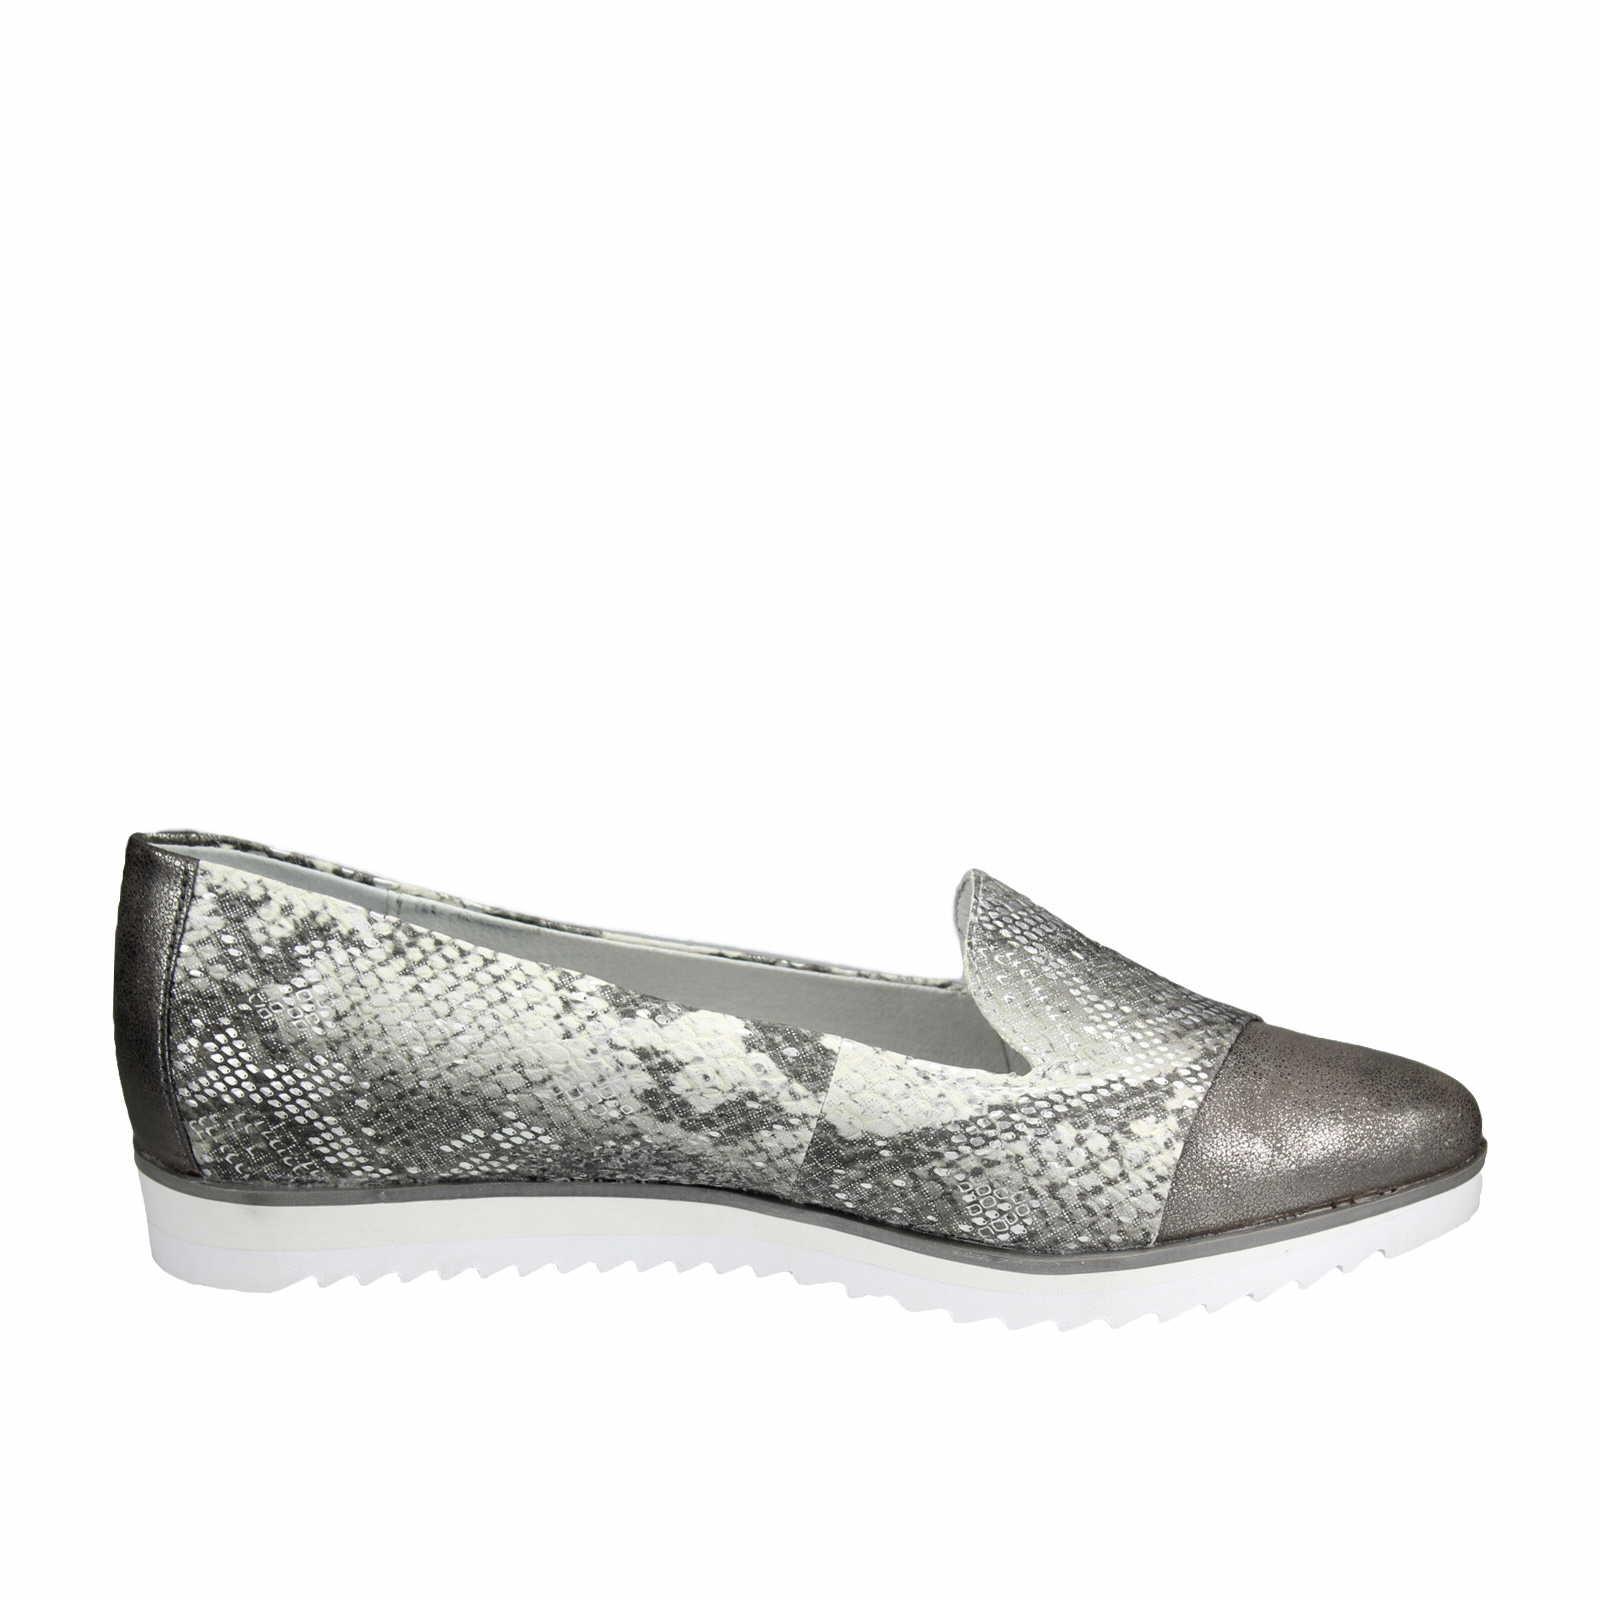 gerry weber shoes bunt evelyn 06 g61106 847 949 schuhparadies online shop schuhe einfach. Black Bedroom Furniture Sets. Home Design Ideas